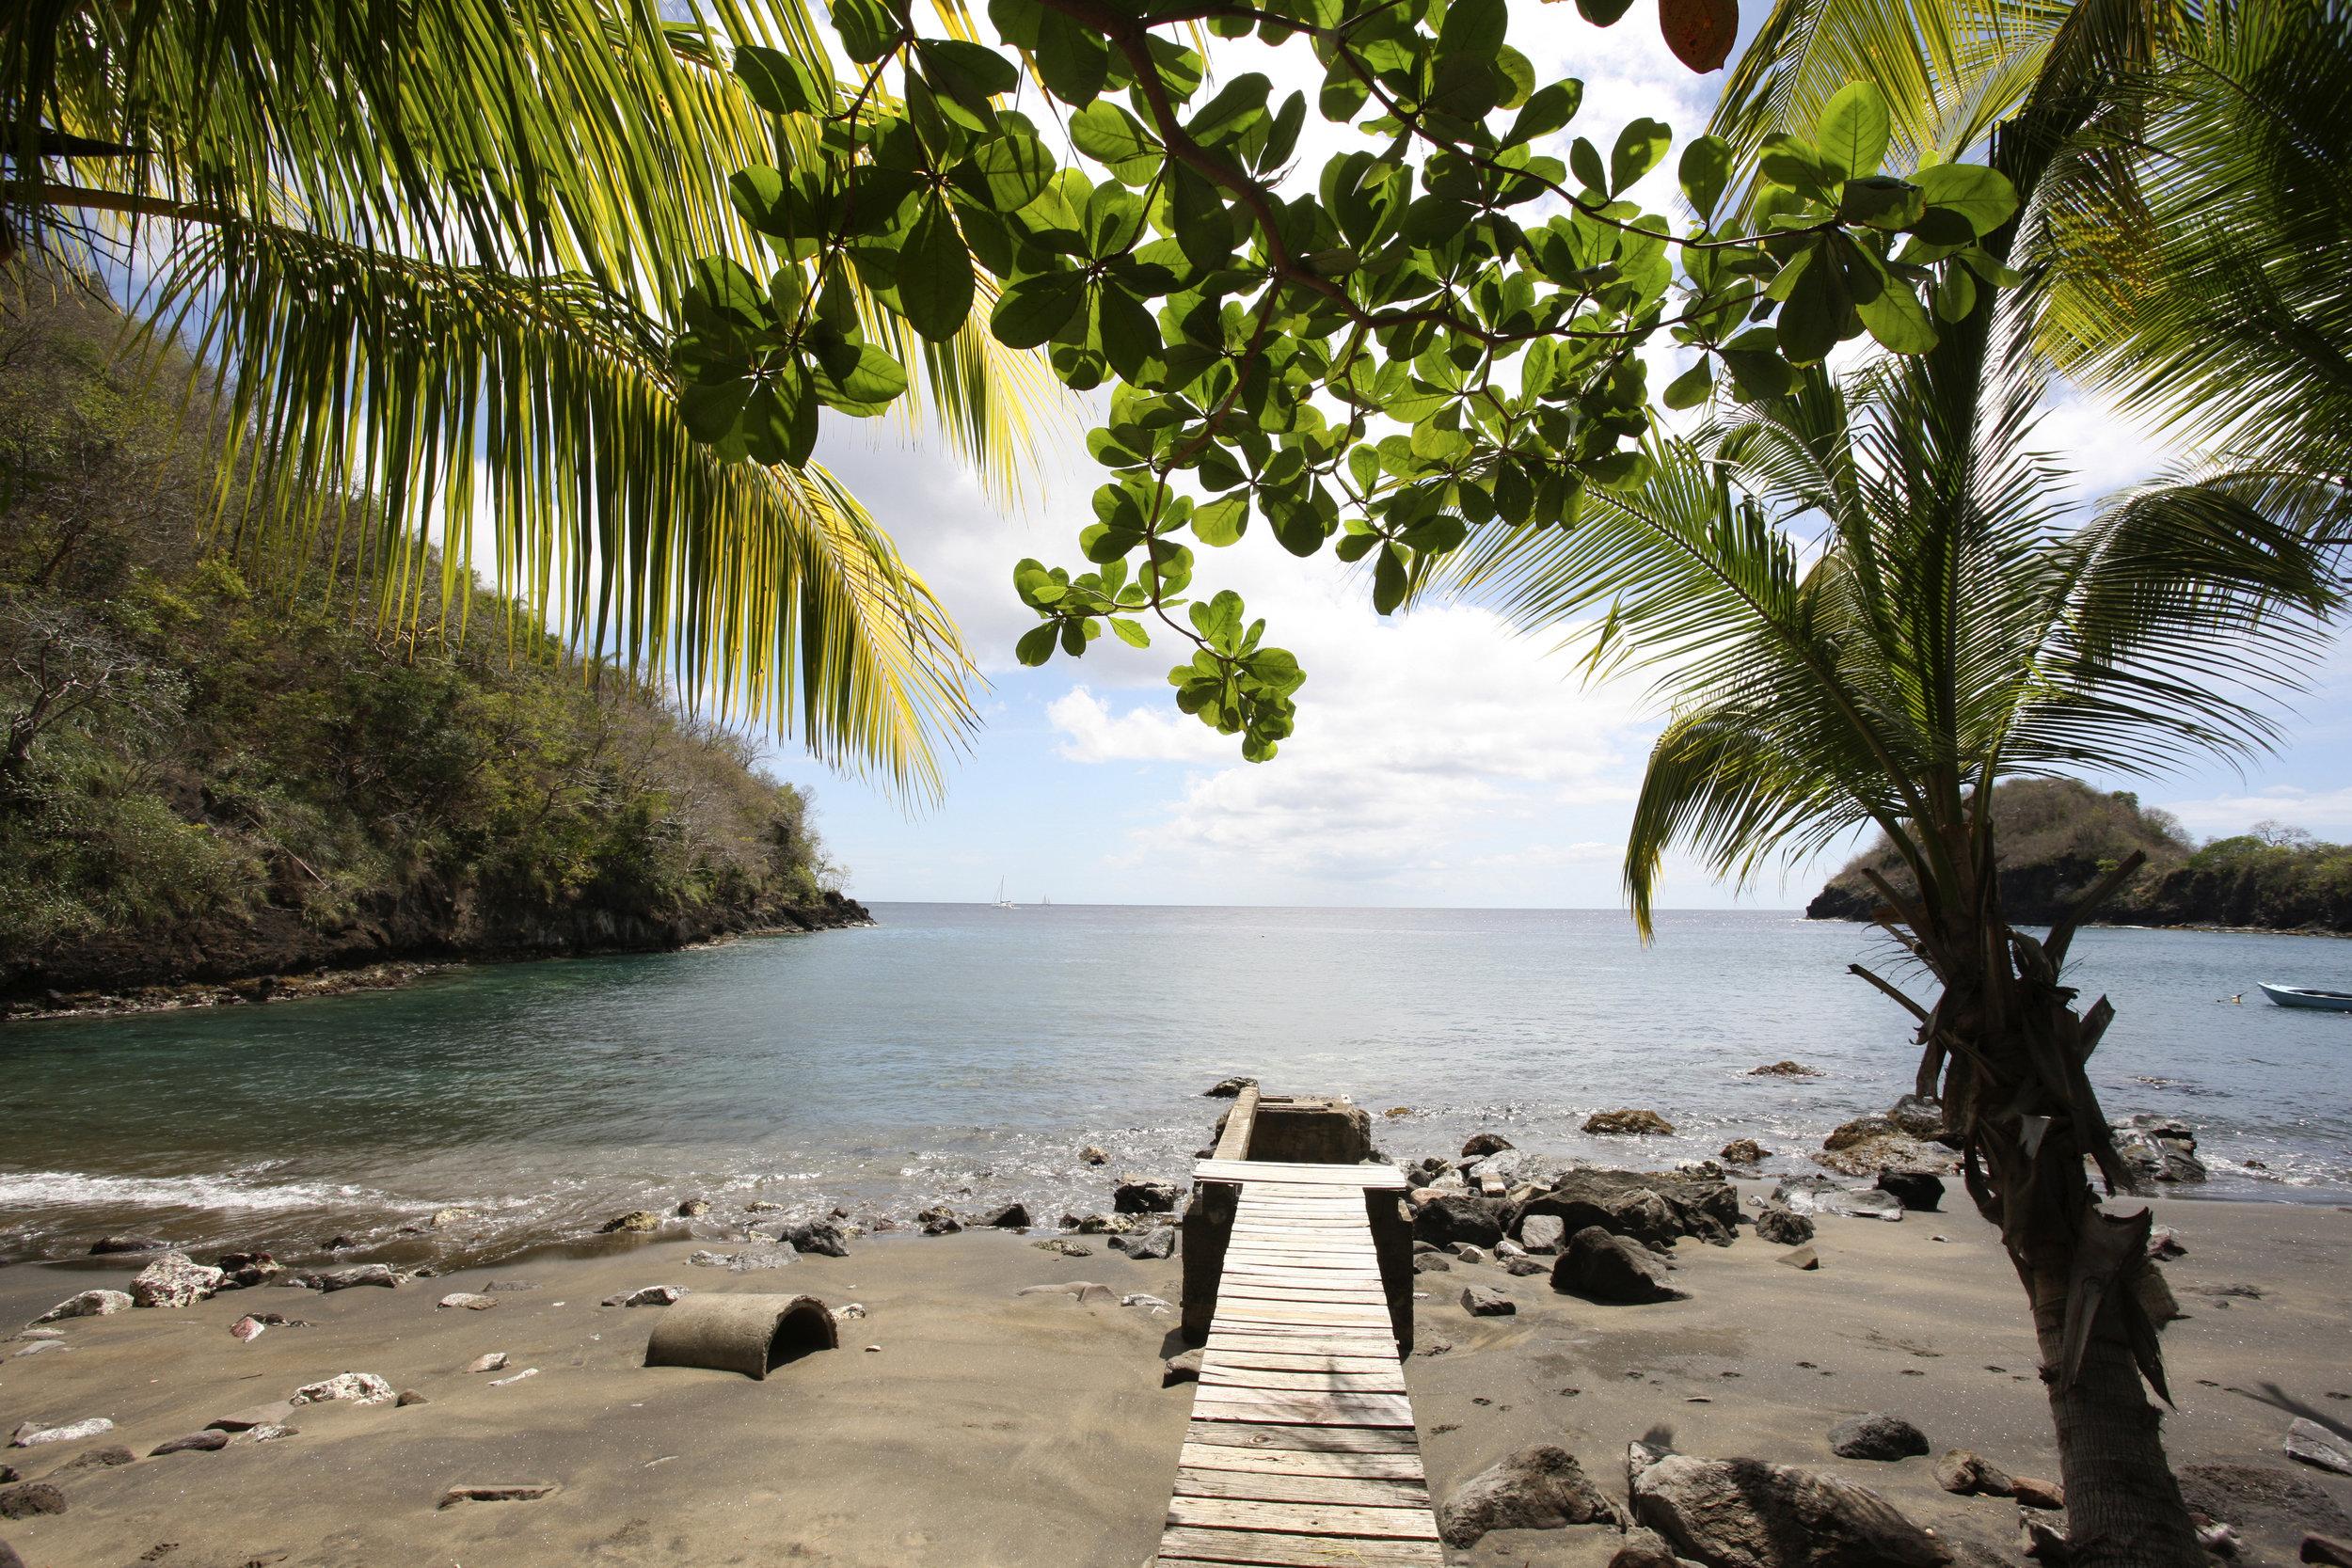 Image courtesy of St. Vincent & the Grenadines Tourist Office/Chris Caldicott